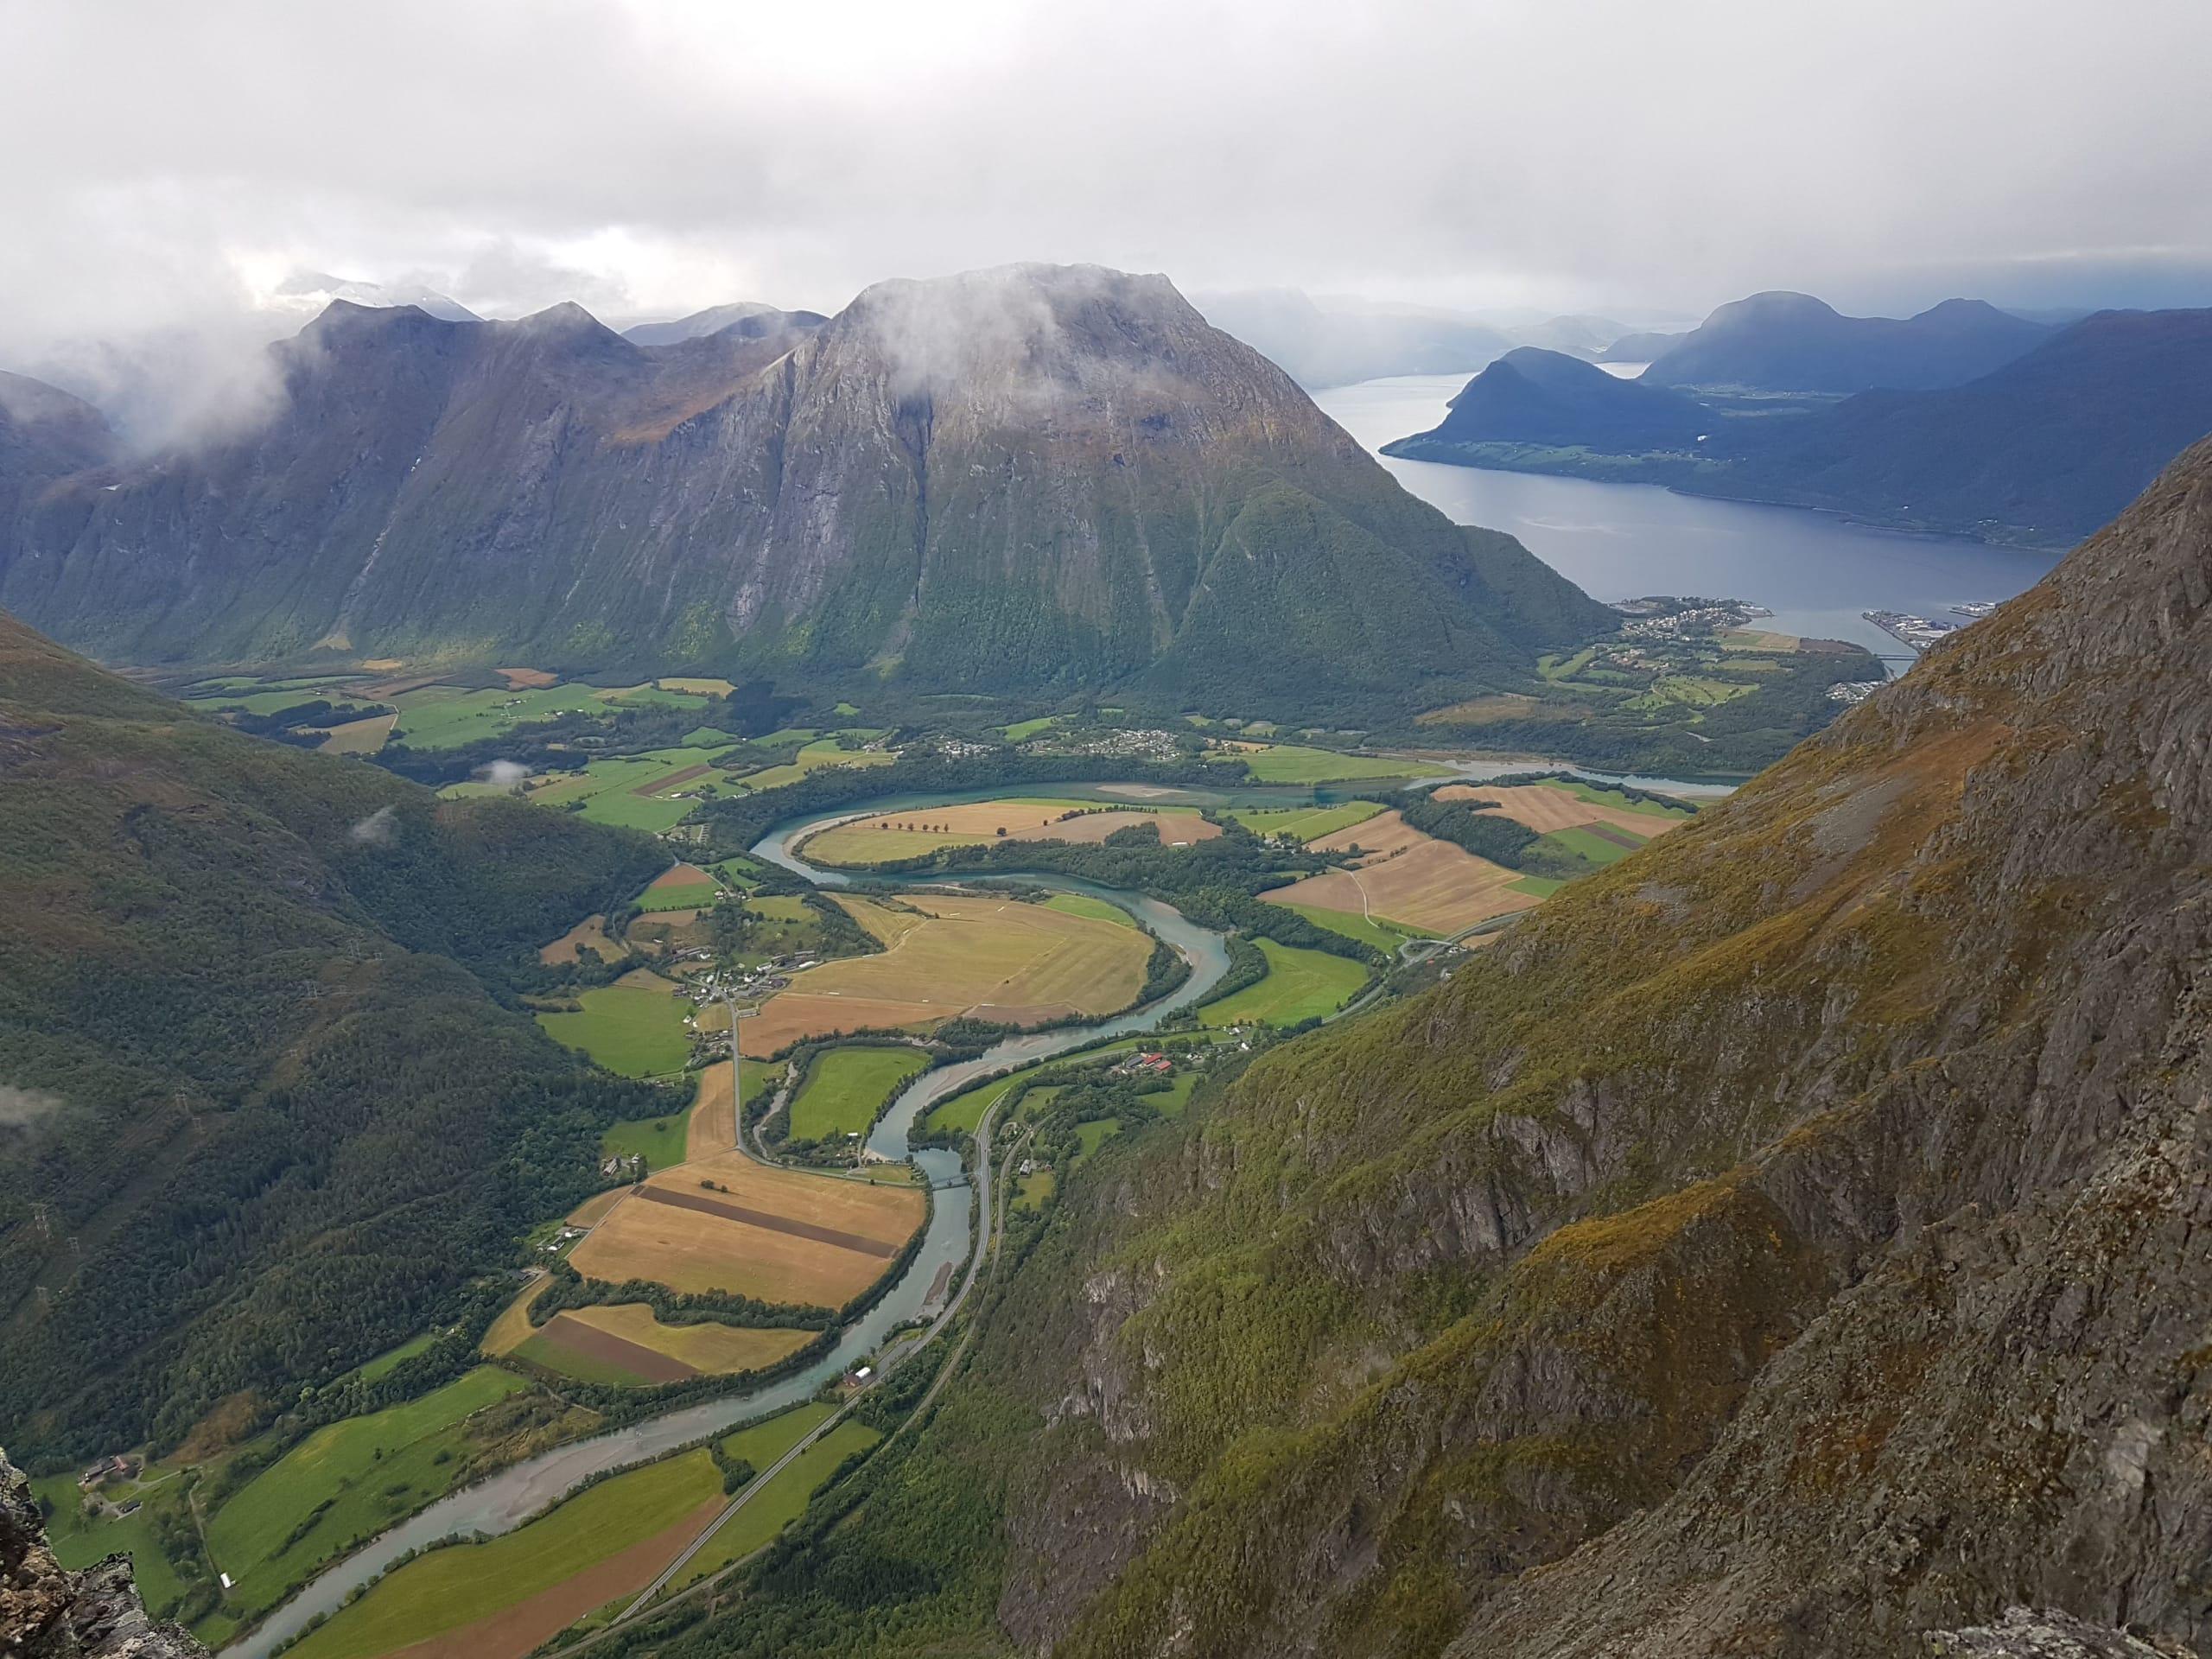 View from Romsdalseggen